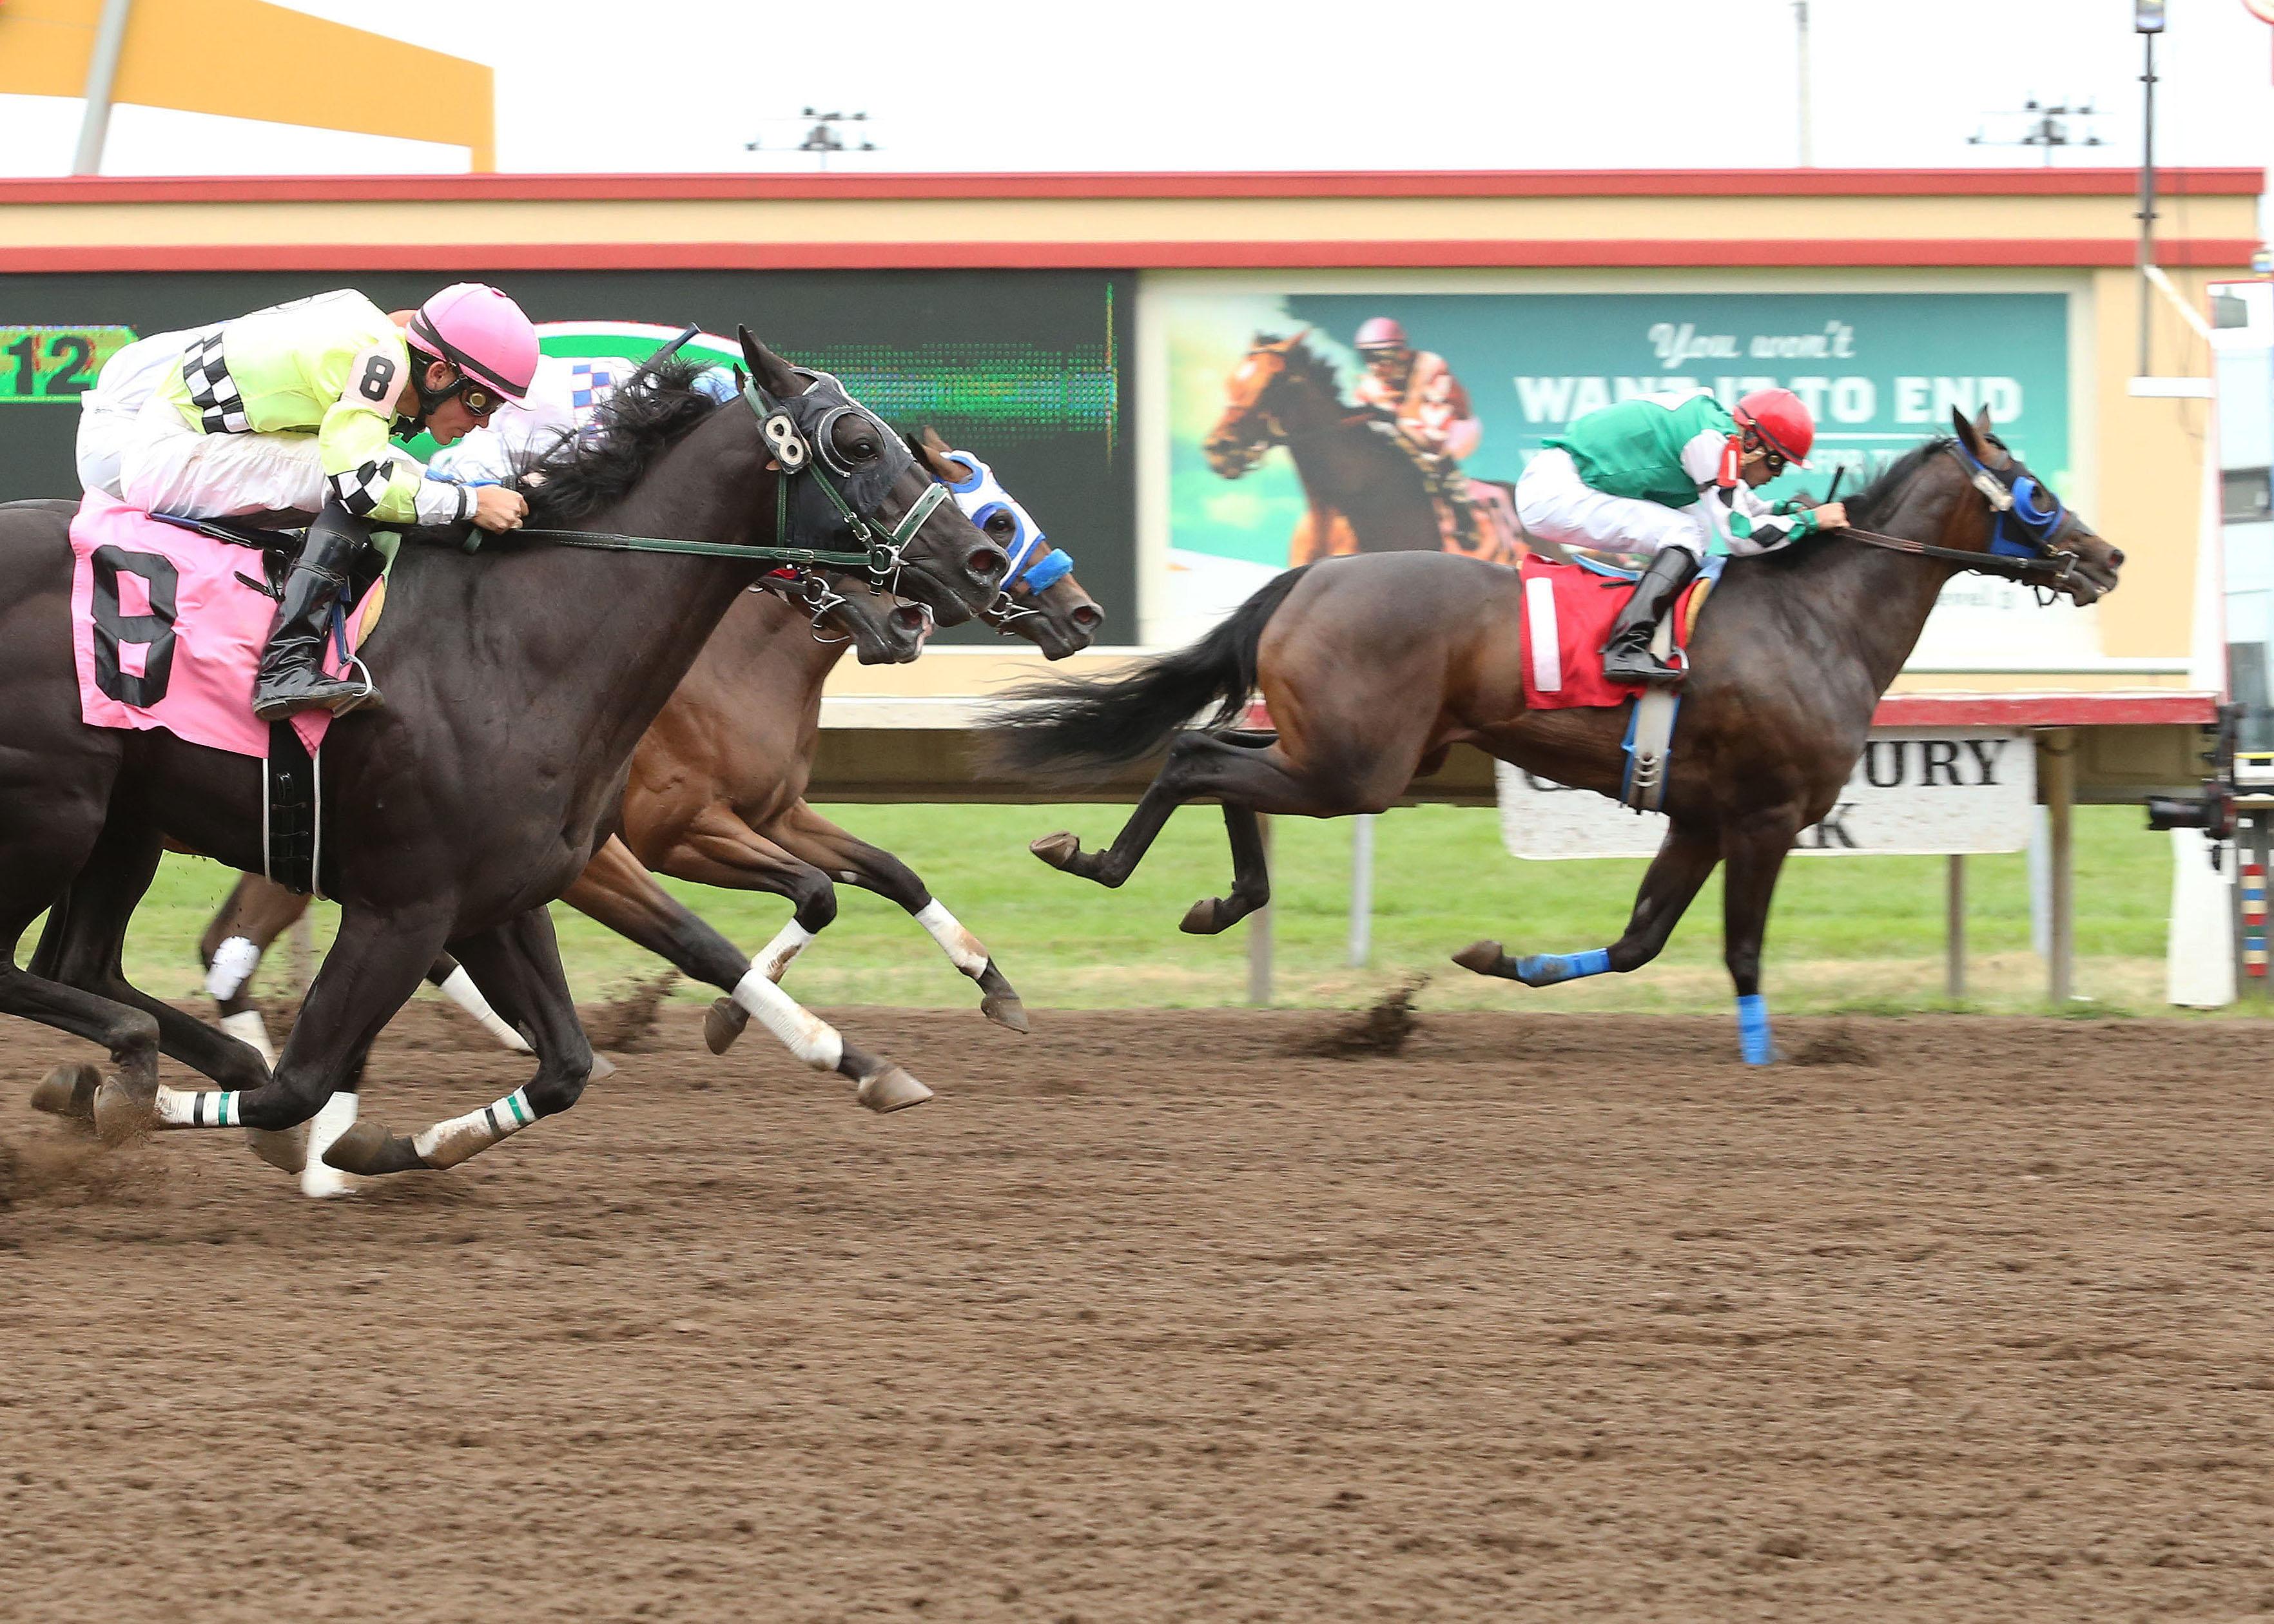 Seis The Royal Cash - North Central Quarter Horse Racing Association Futurity - 08-04-13 - R08 - CBY - Finish